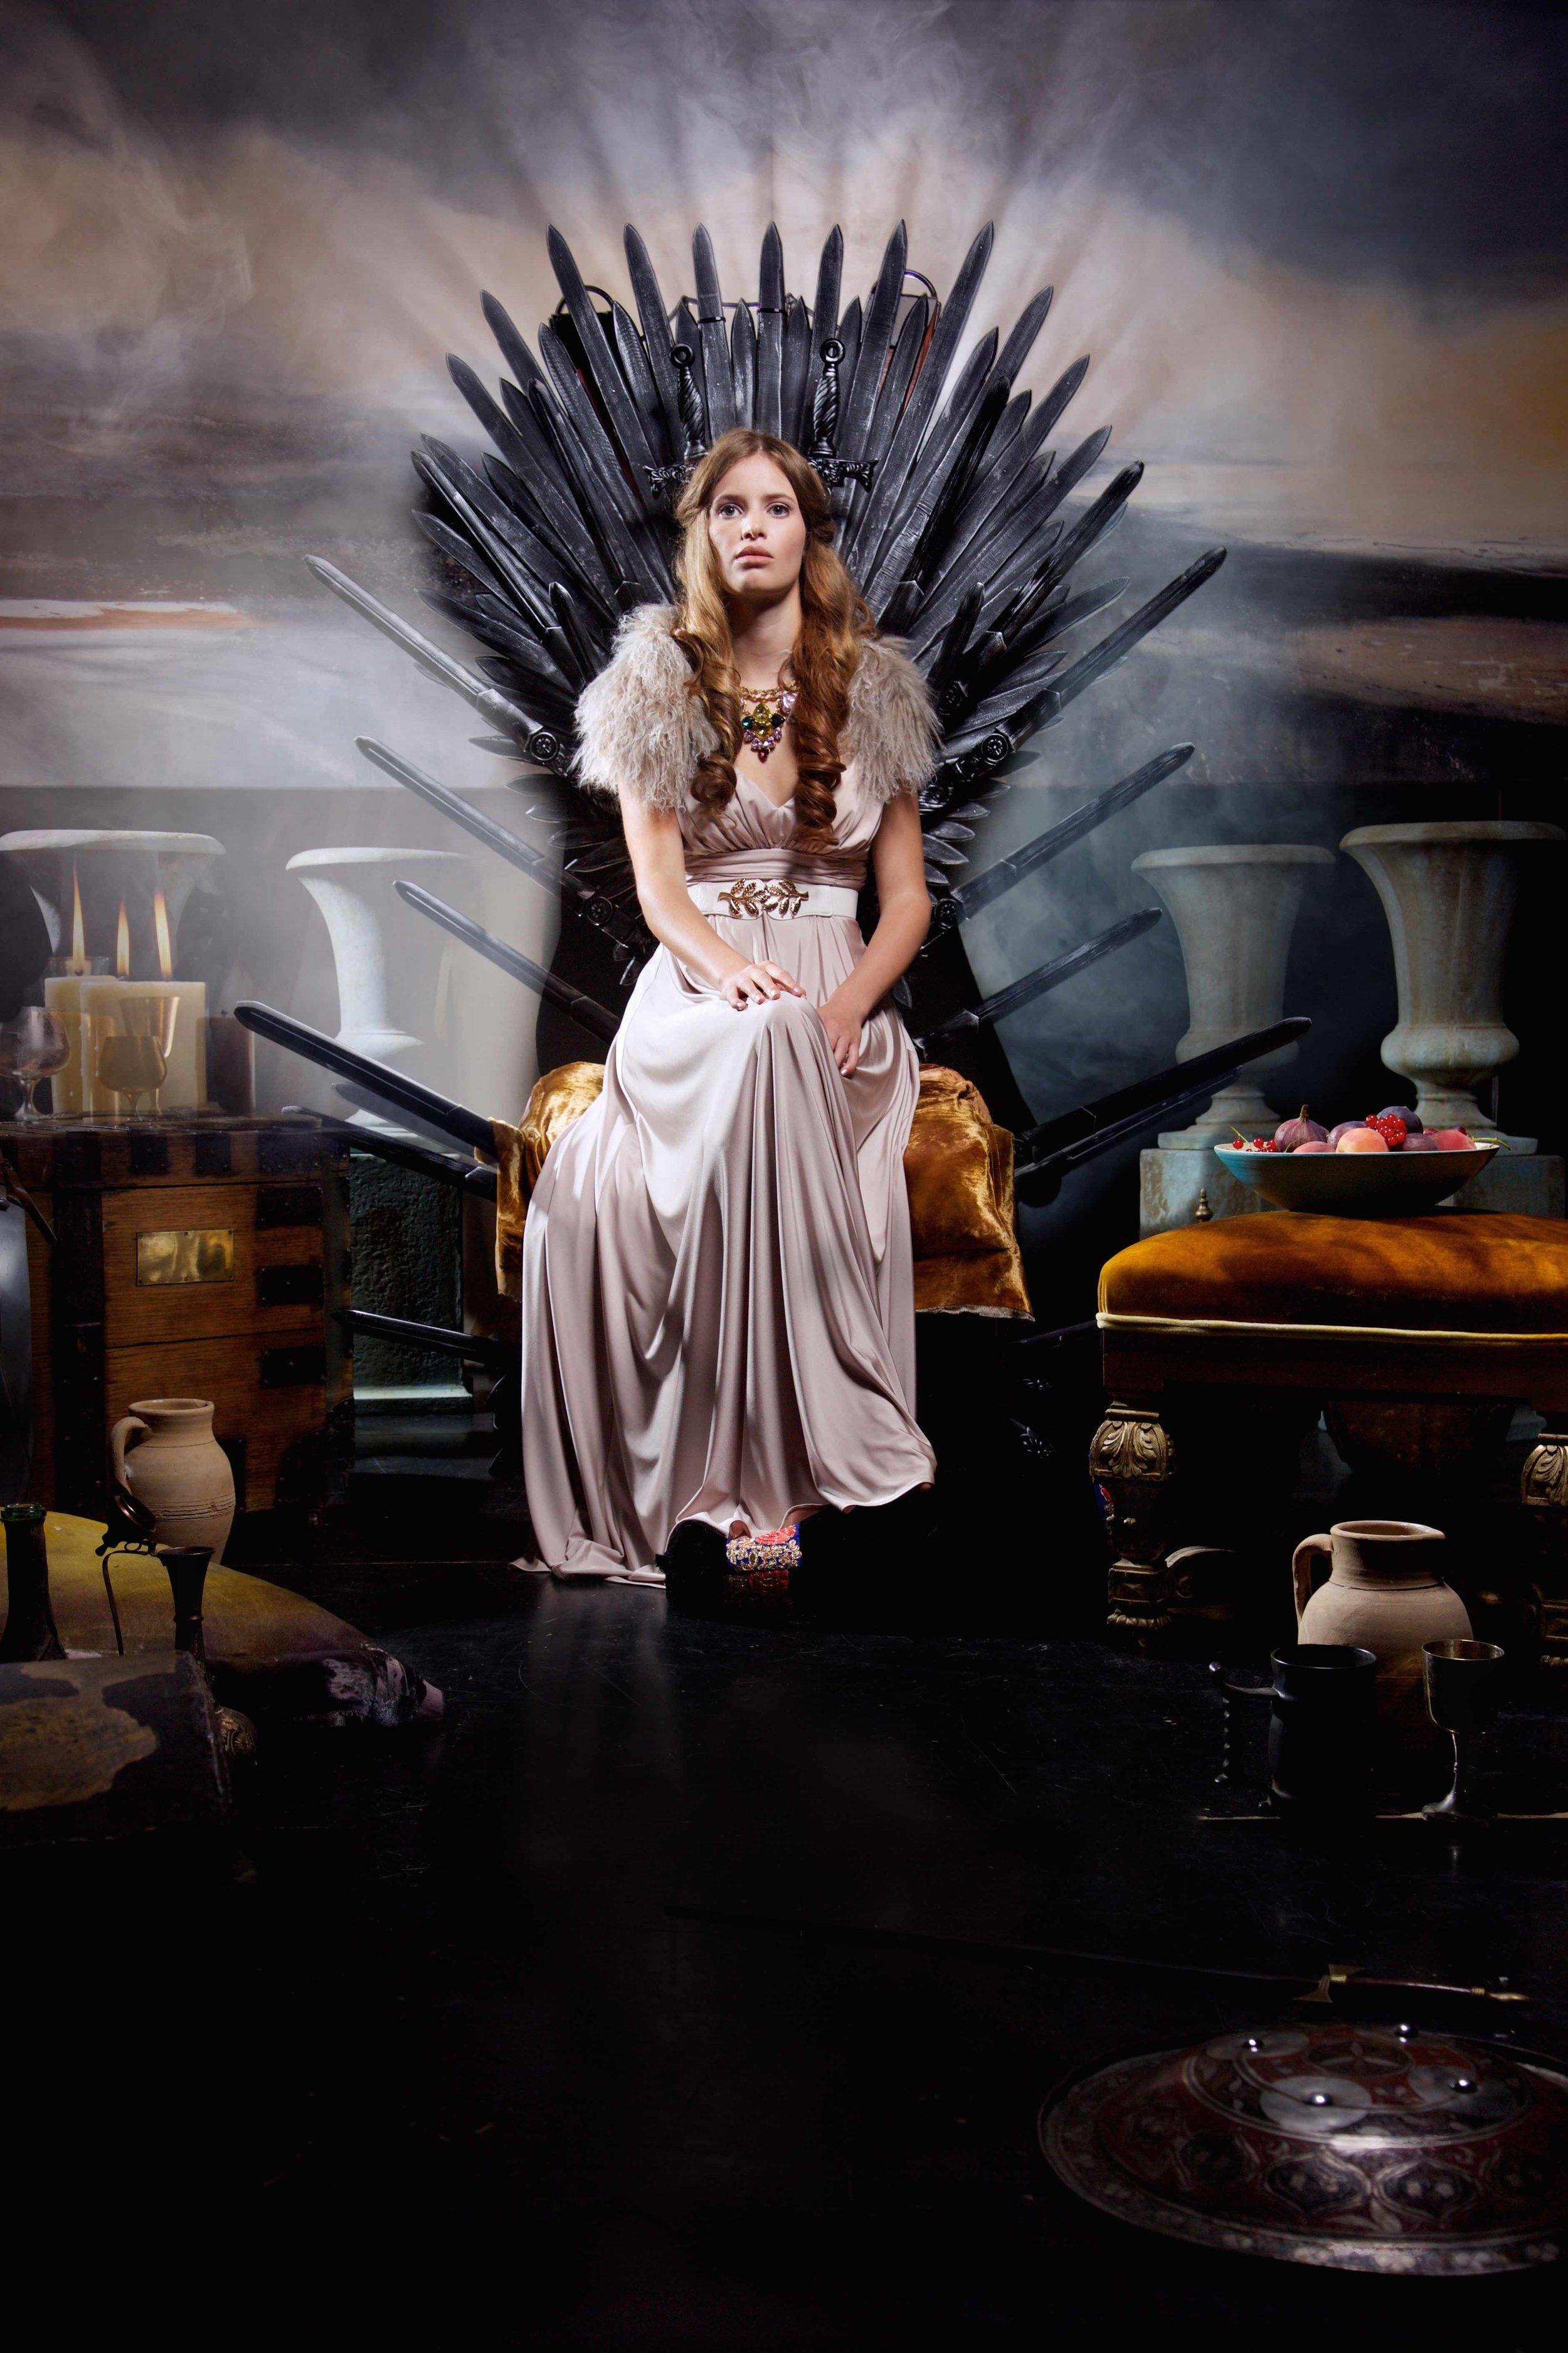 Game of Thrones The Bath Magazine © Marc Aitken 2016 22016-09-062016.jpg